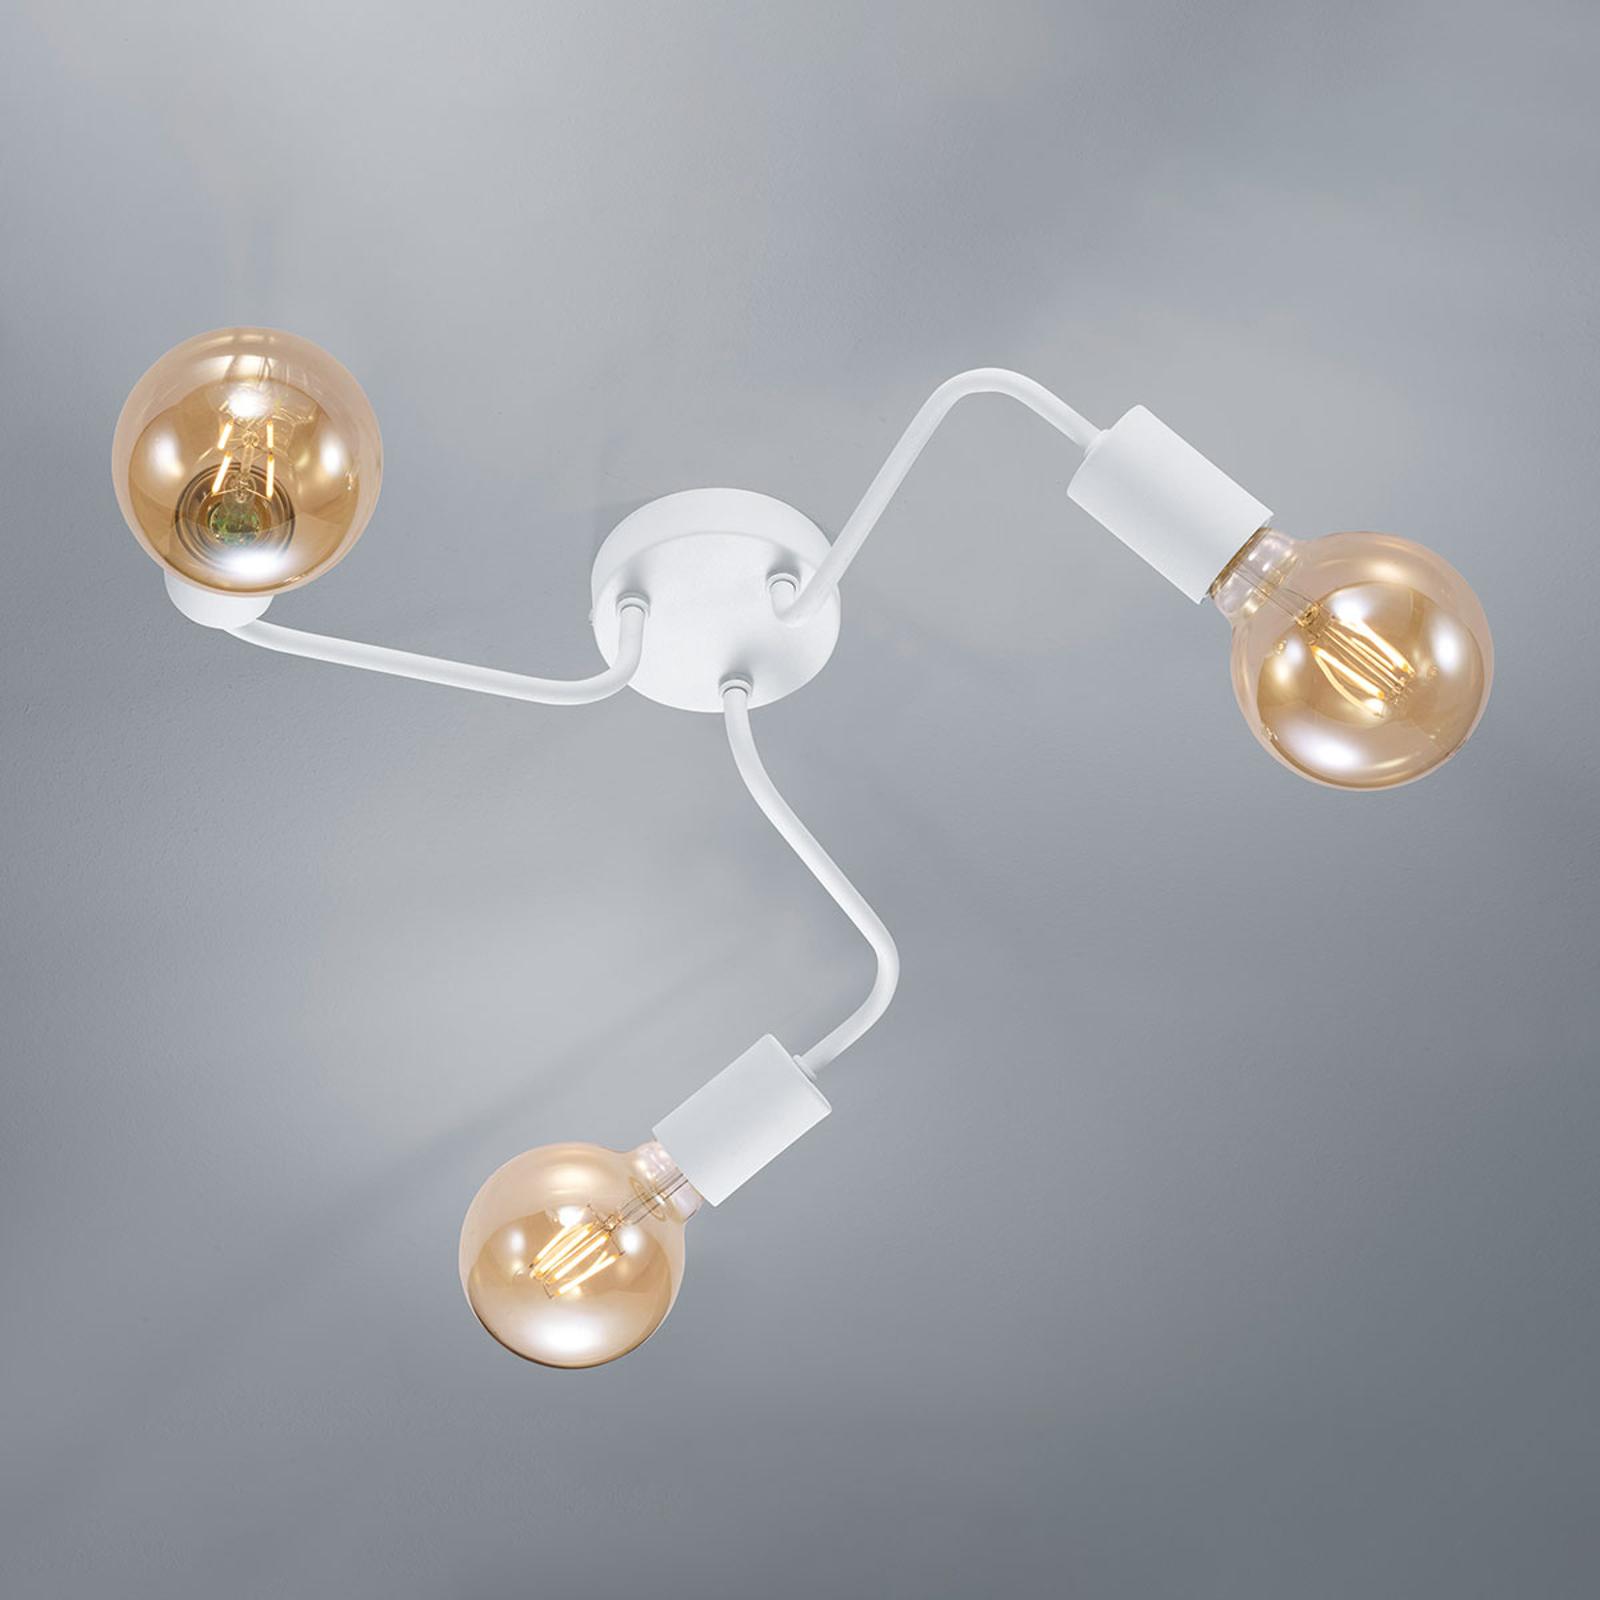 Lampa sufitowa Diallo 3-punktowa biała matowa